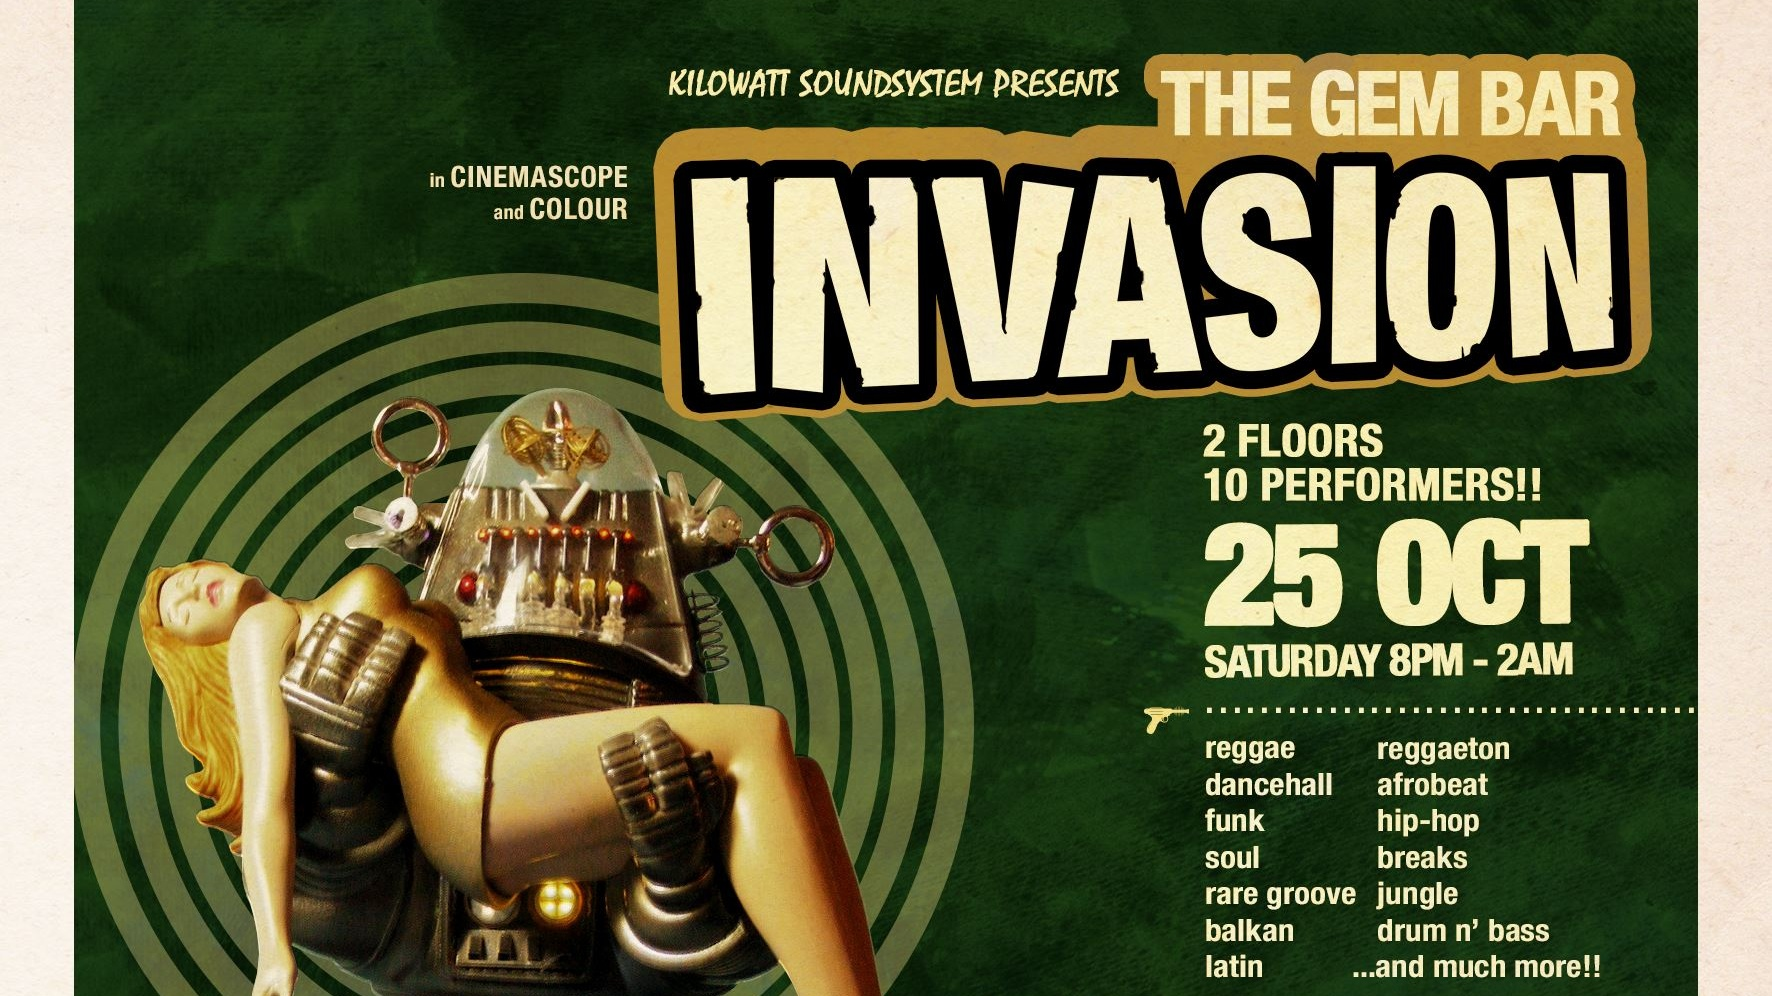 KiloWatt Soundsystem presents: The GEM Bar Invasion